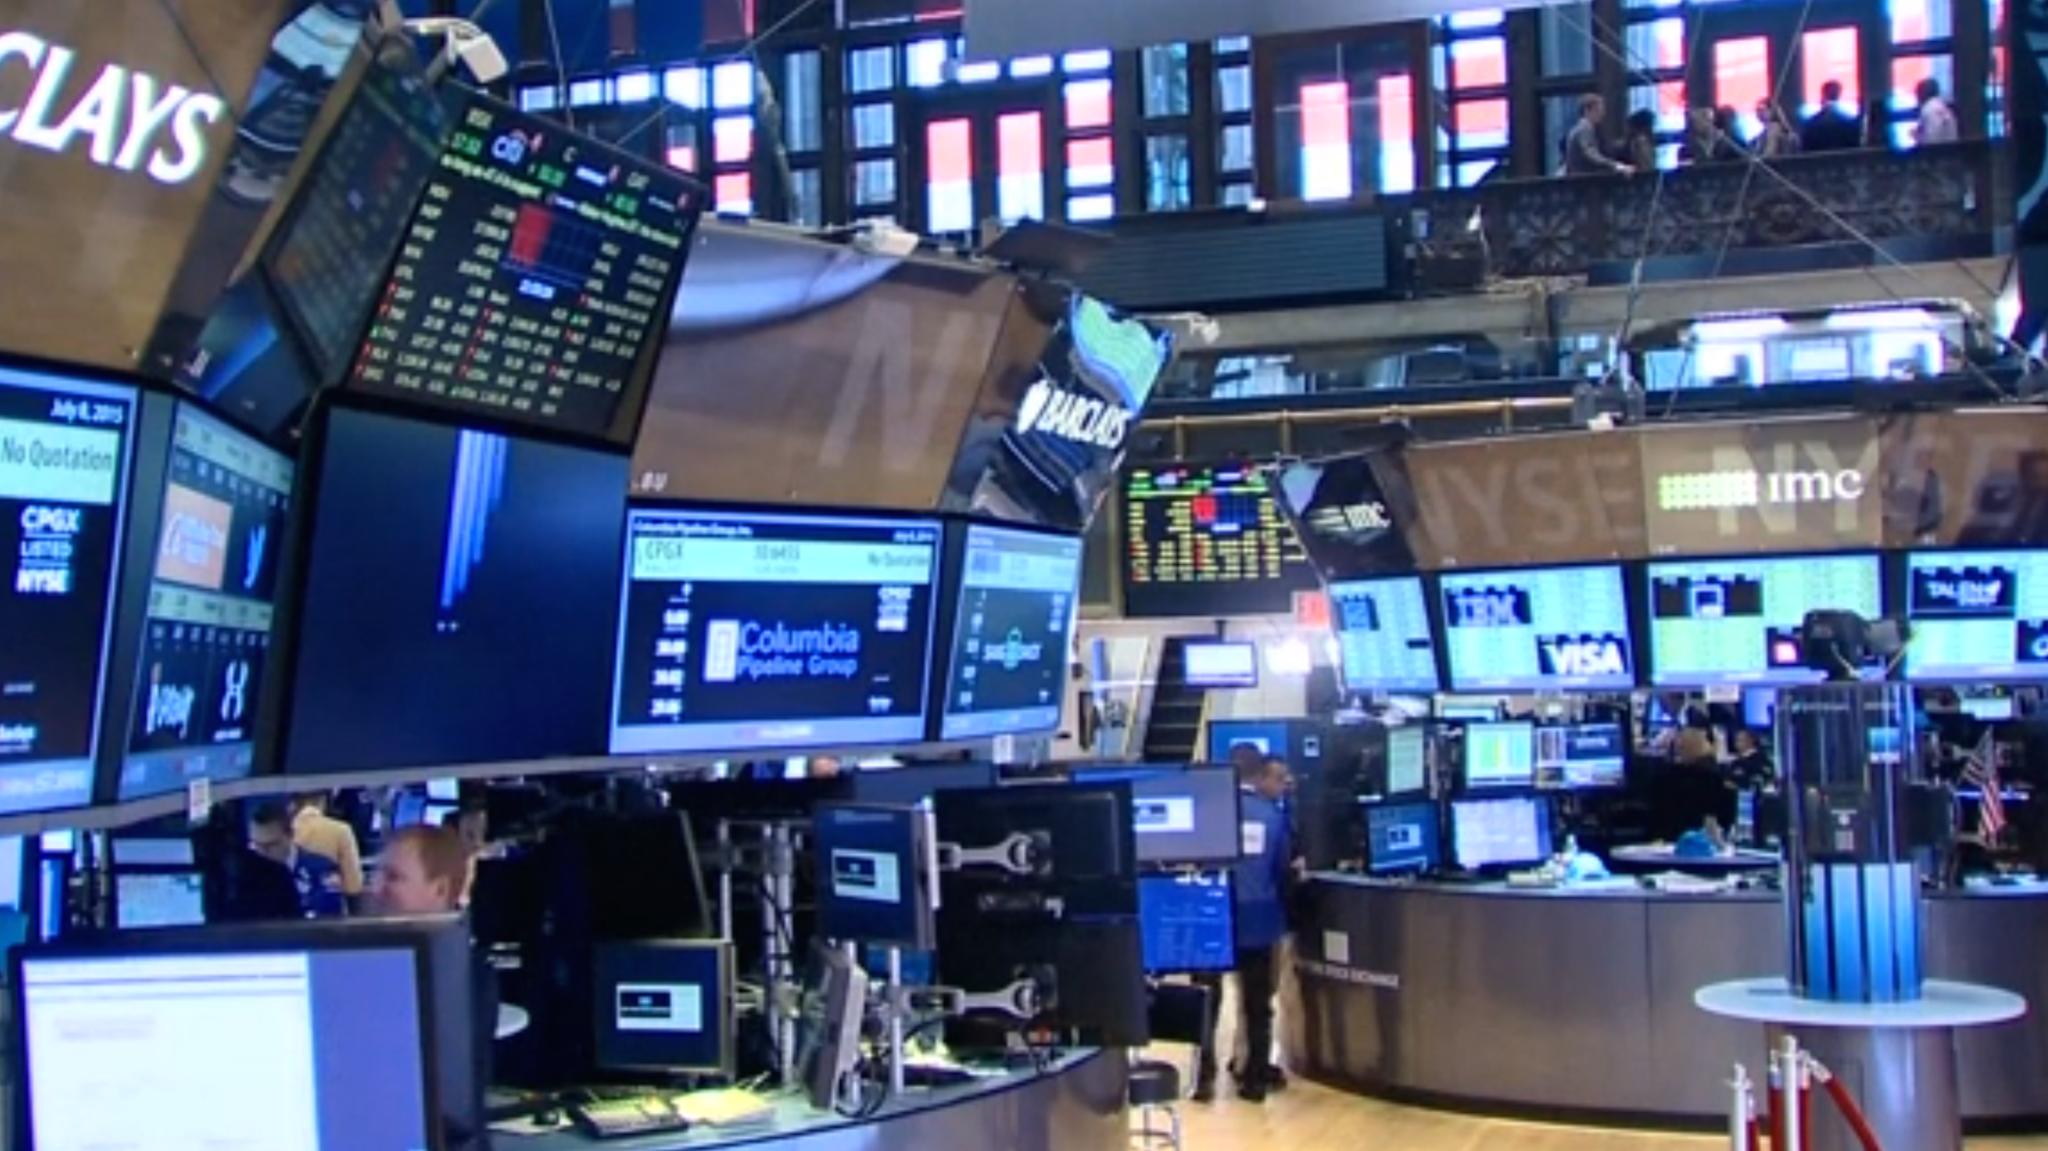 VVUS SEC Filings - VIVUS Inc. SEC Filings - MarketWatch